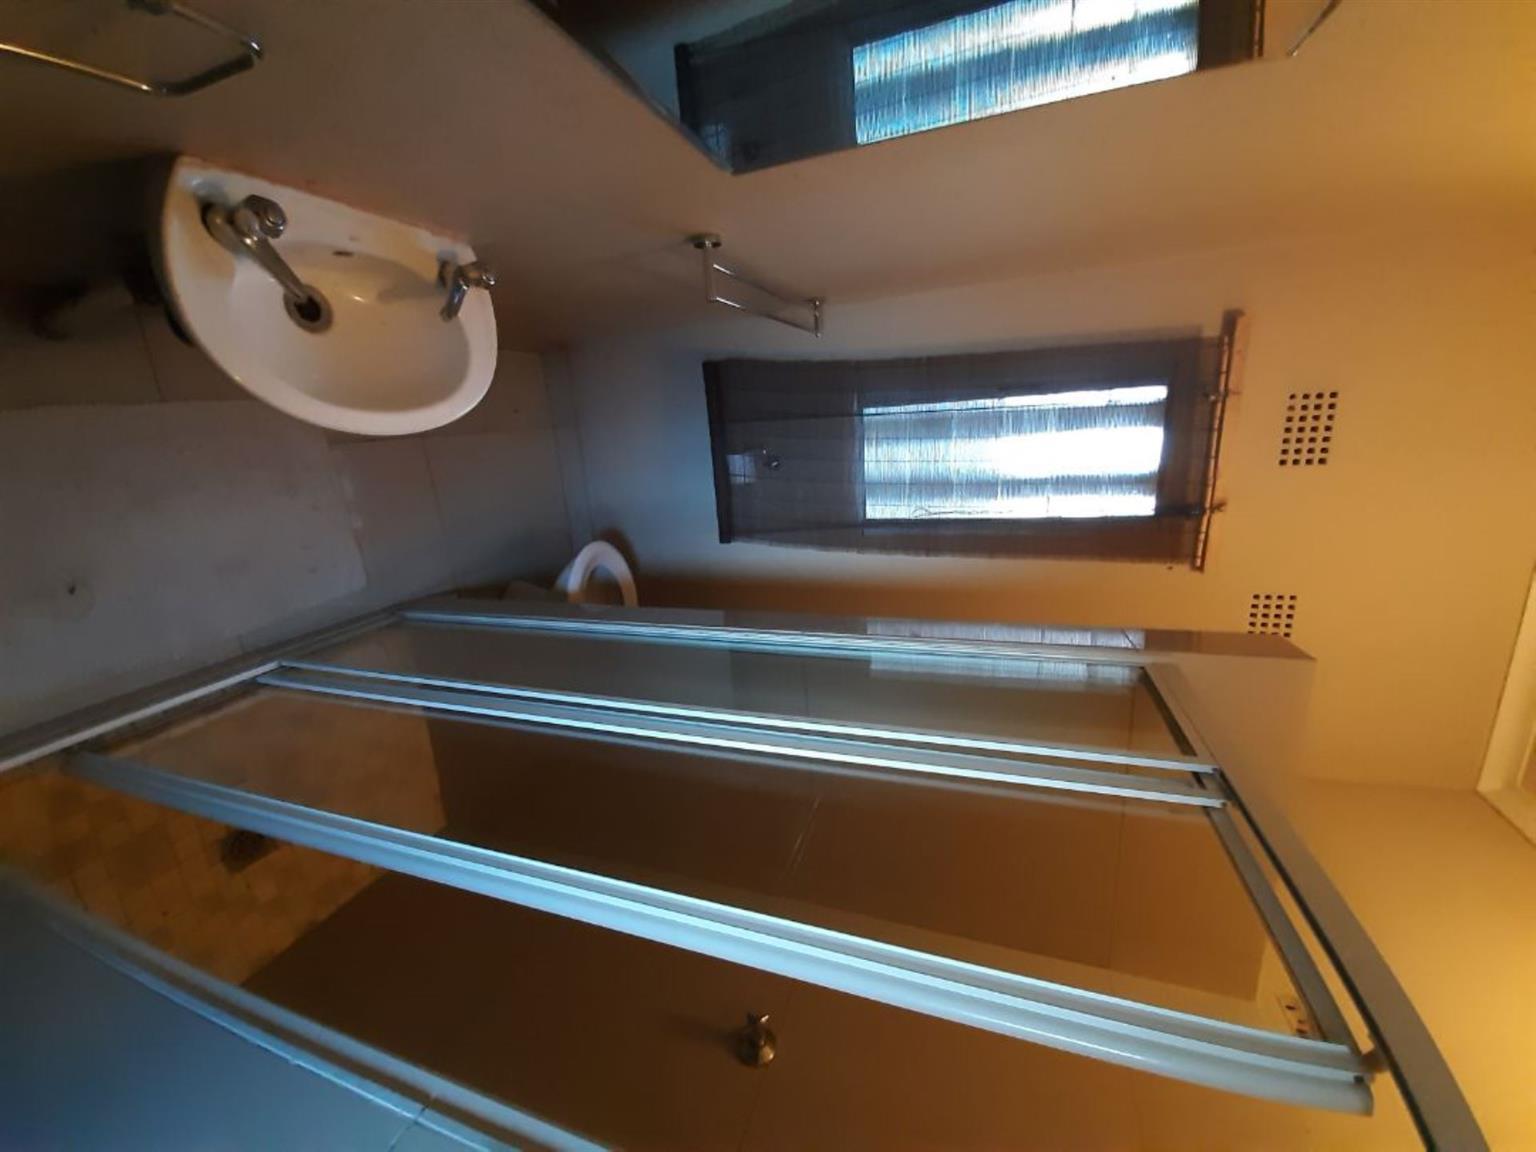 Apartment Rental Monthly in FOURWAYS